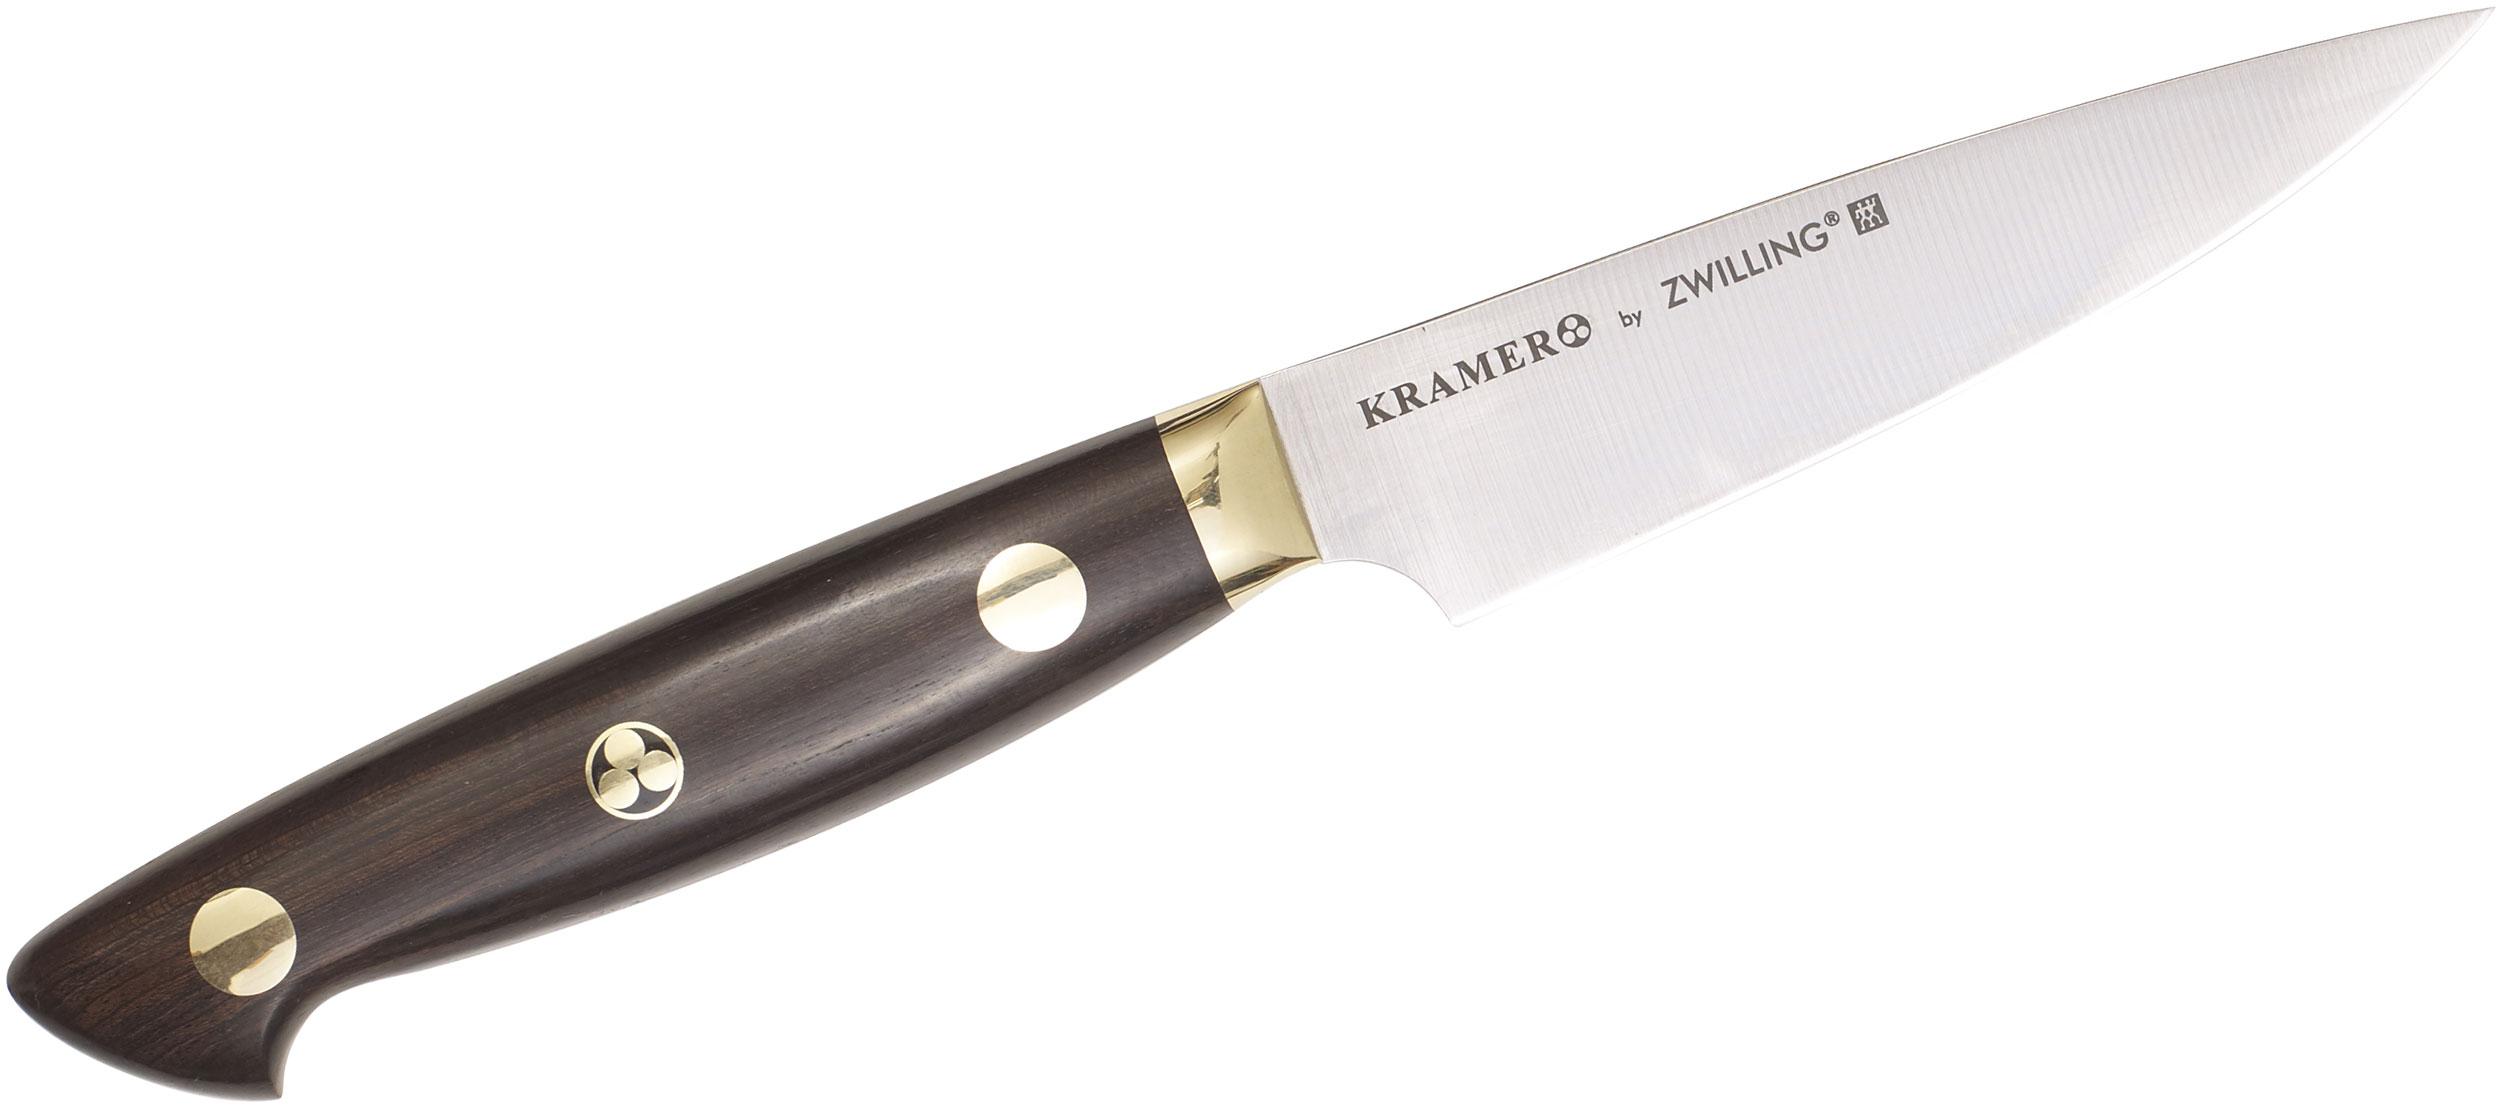 Zwilling J.A. Henckels EUROLine Bob Kramer 3.5 inch Paring Knife, Grenadille Wood Handle